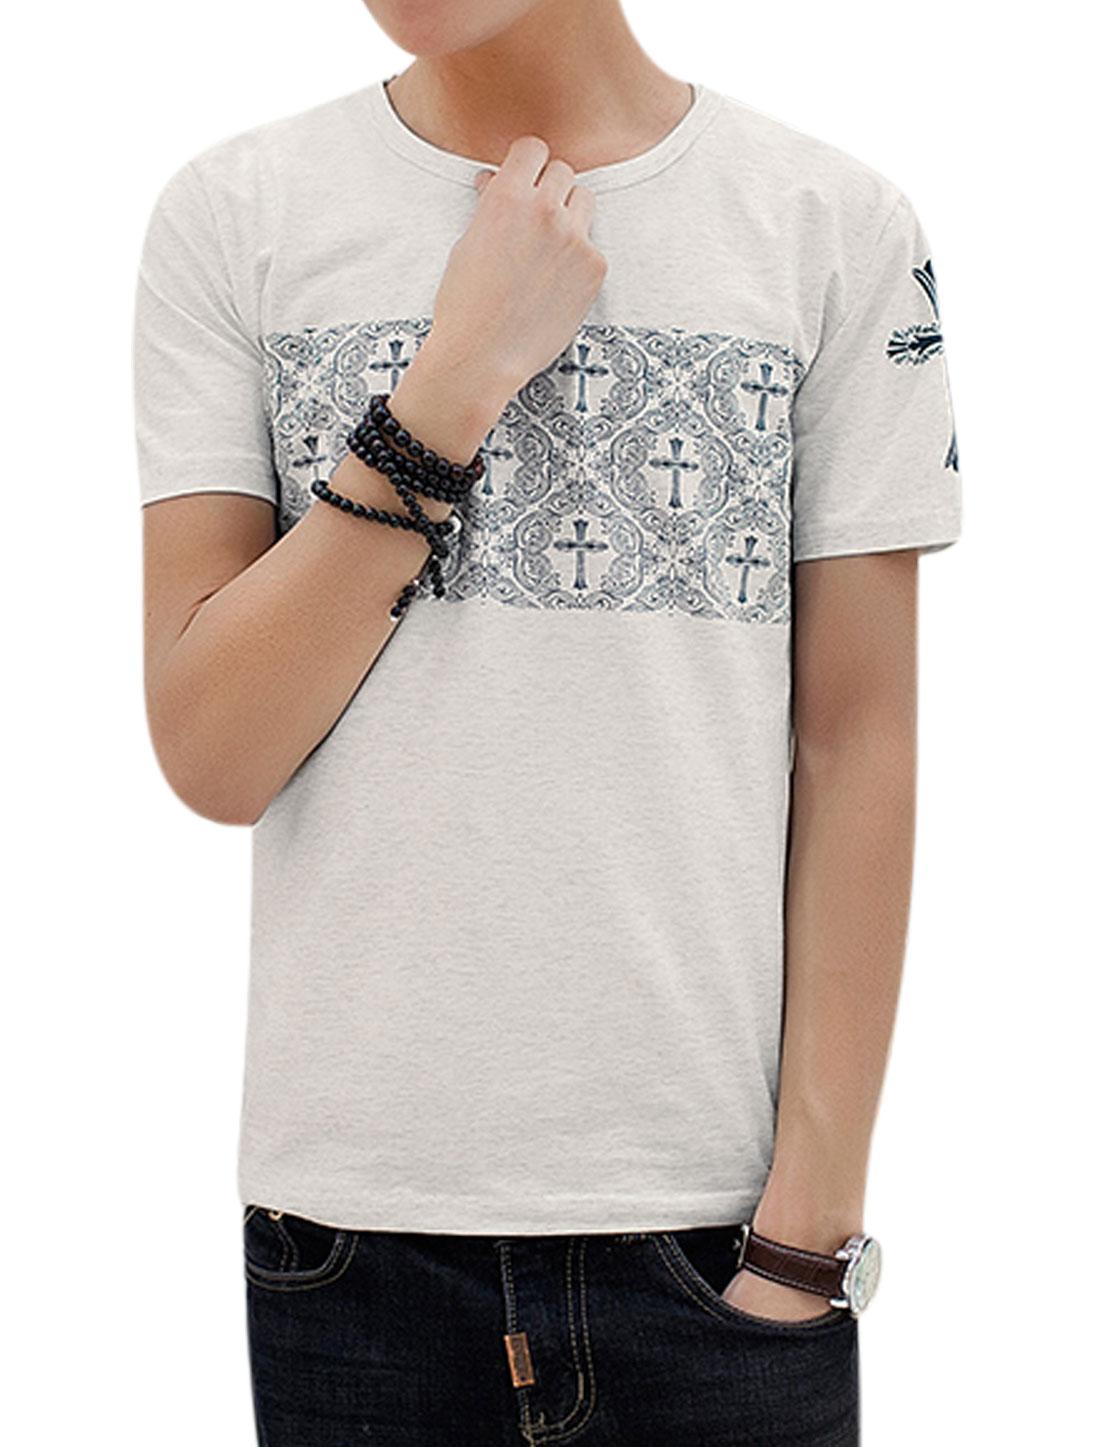 Man Short Sleeves Cross Novelty Prints T-Shirts Light Gray S